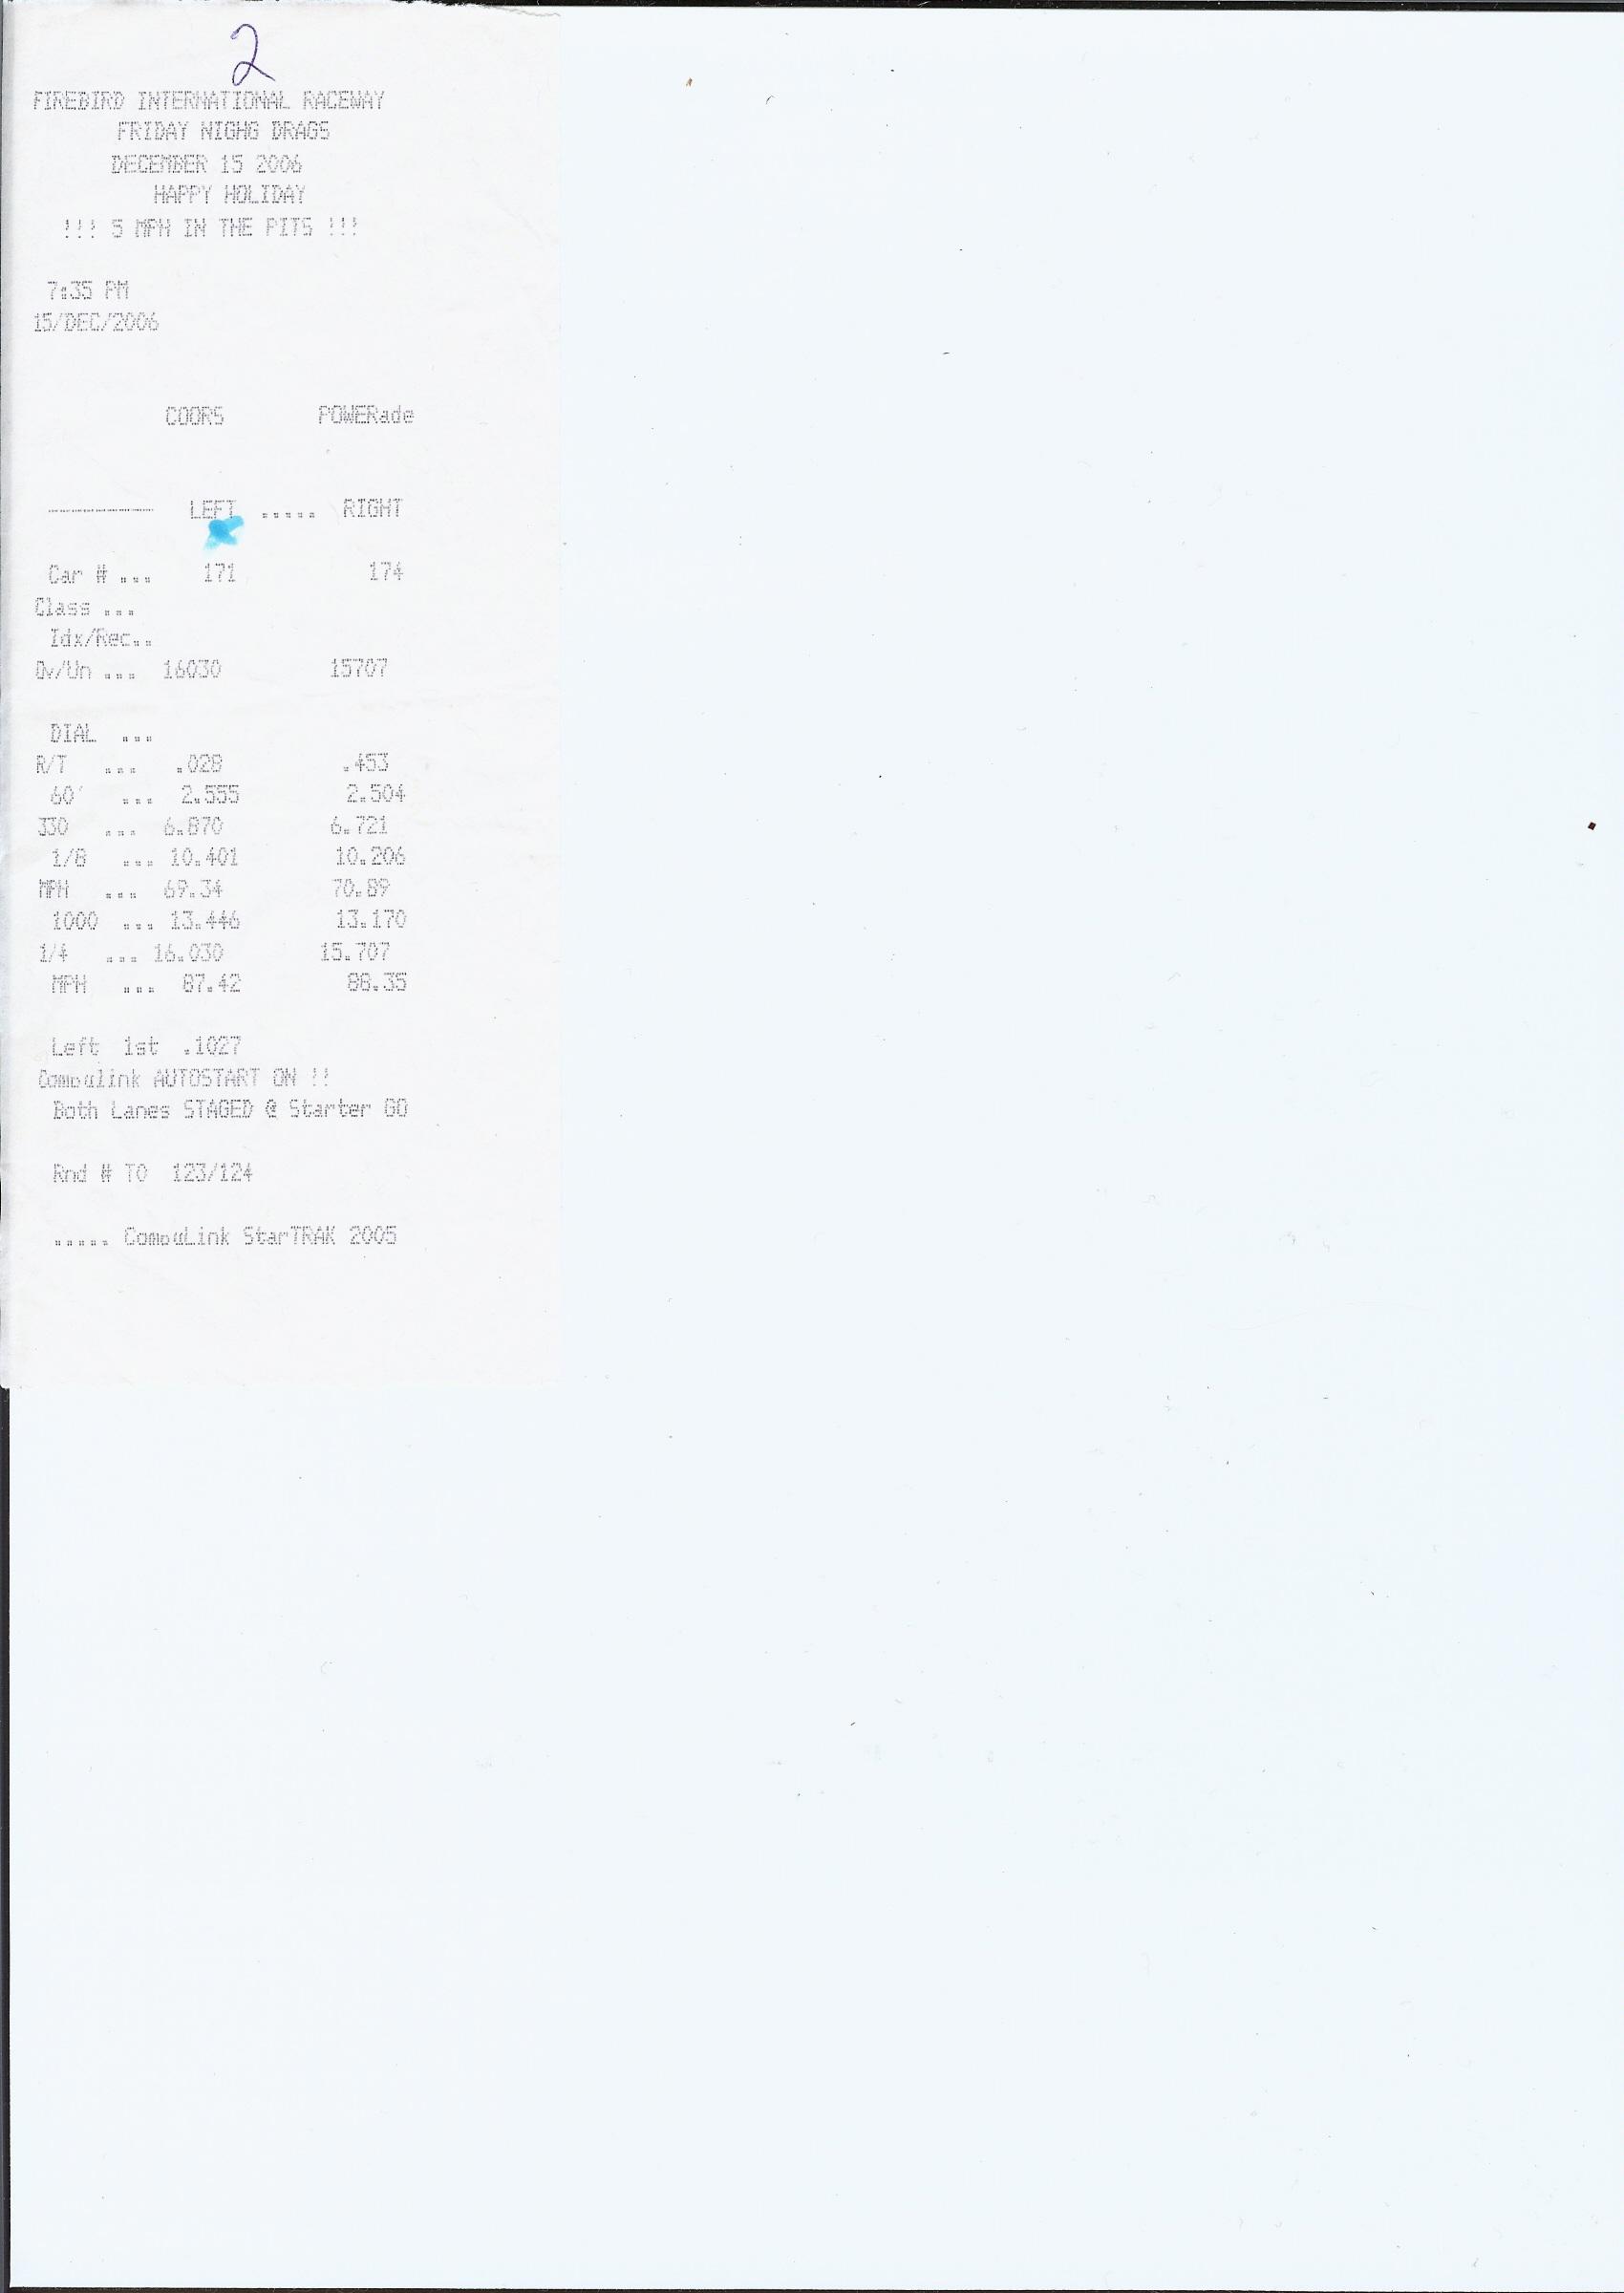 Nissan Titan Timeslip Scan